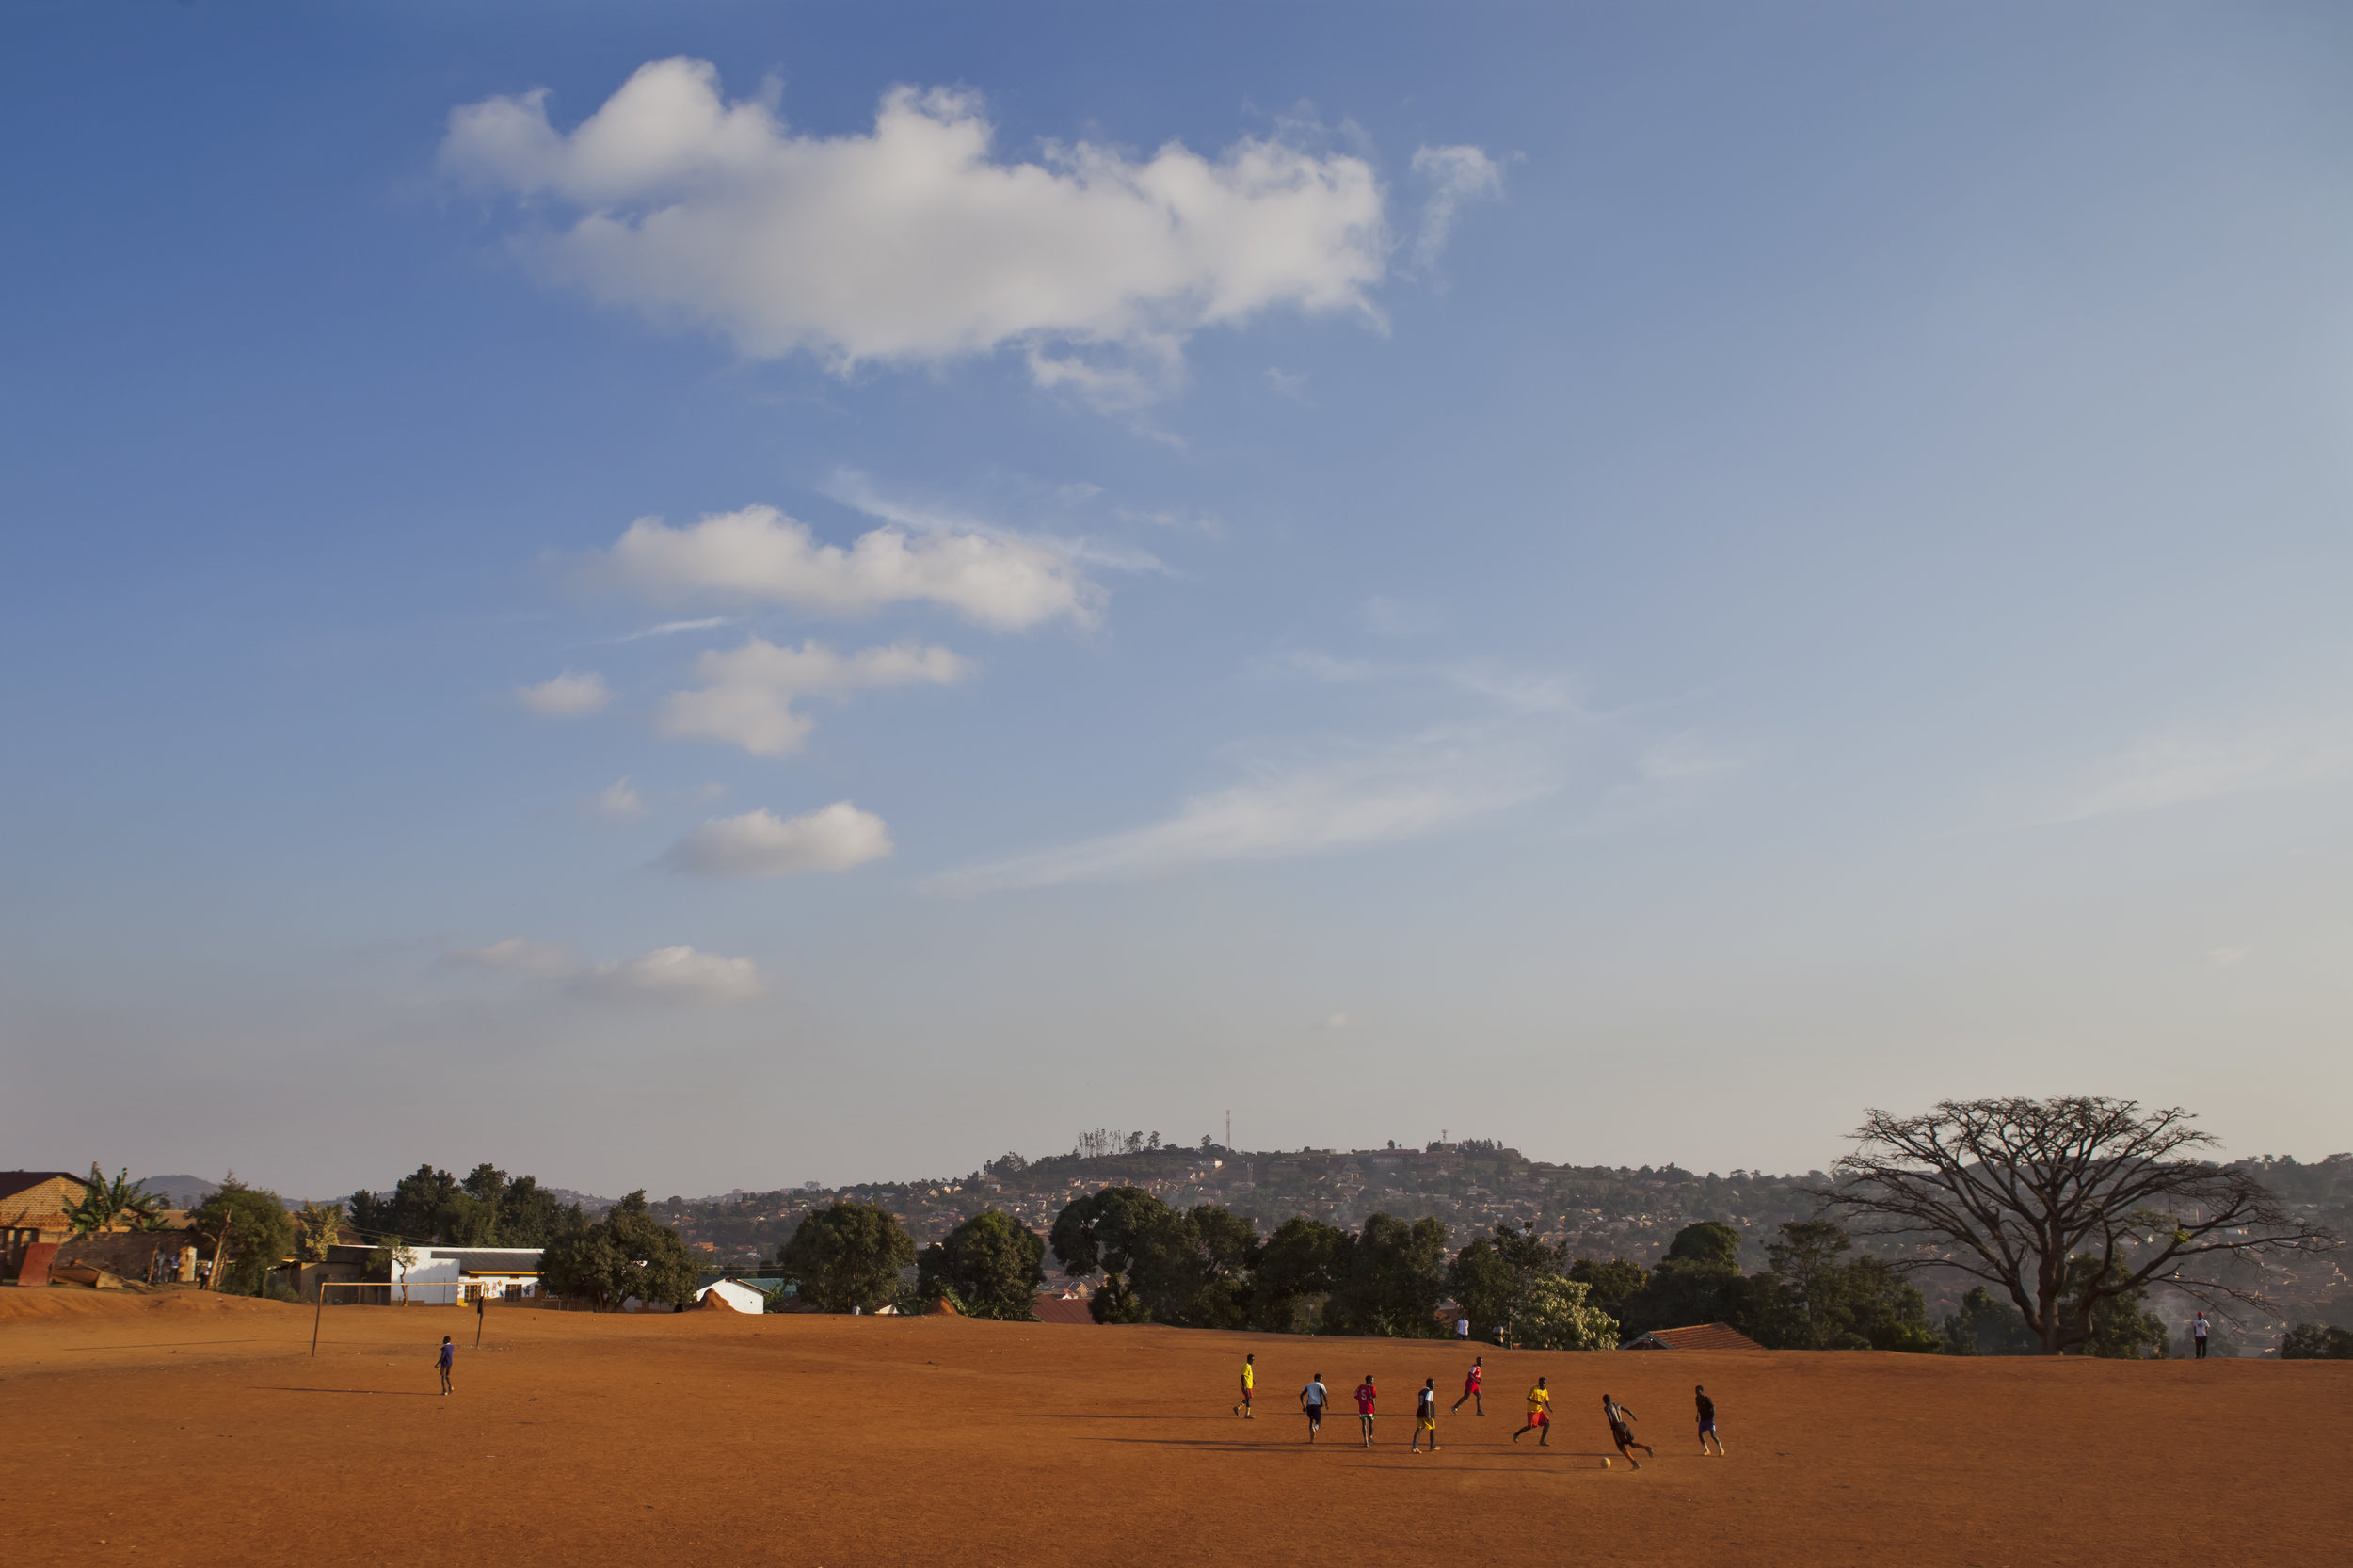 Kampala_Soccer_Field.jpg